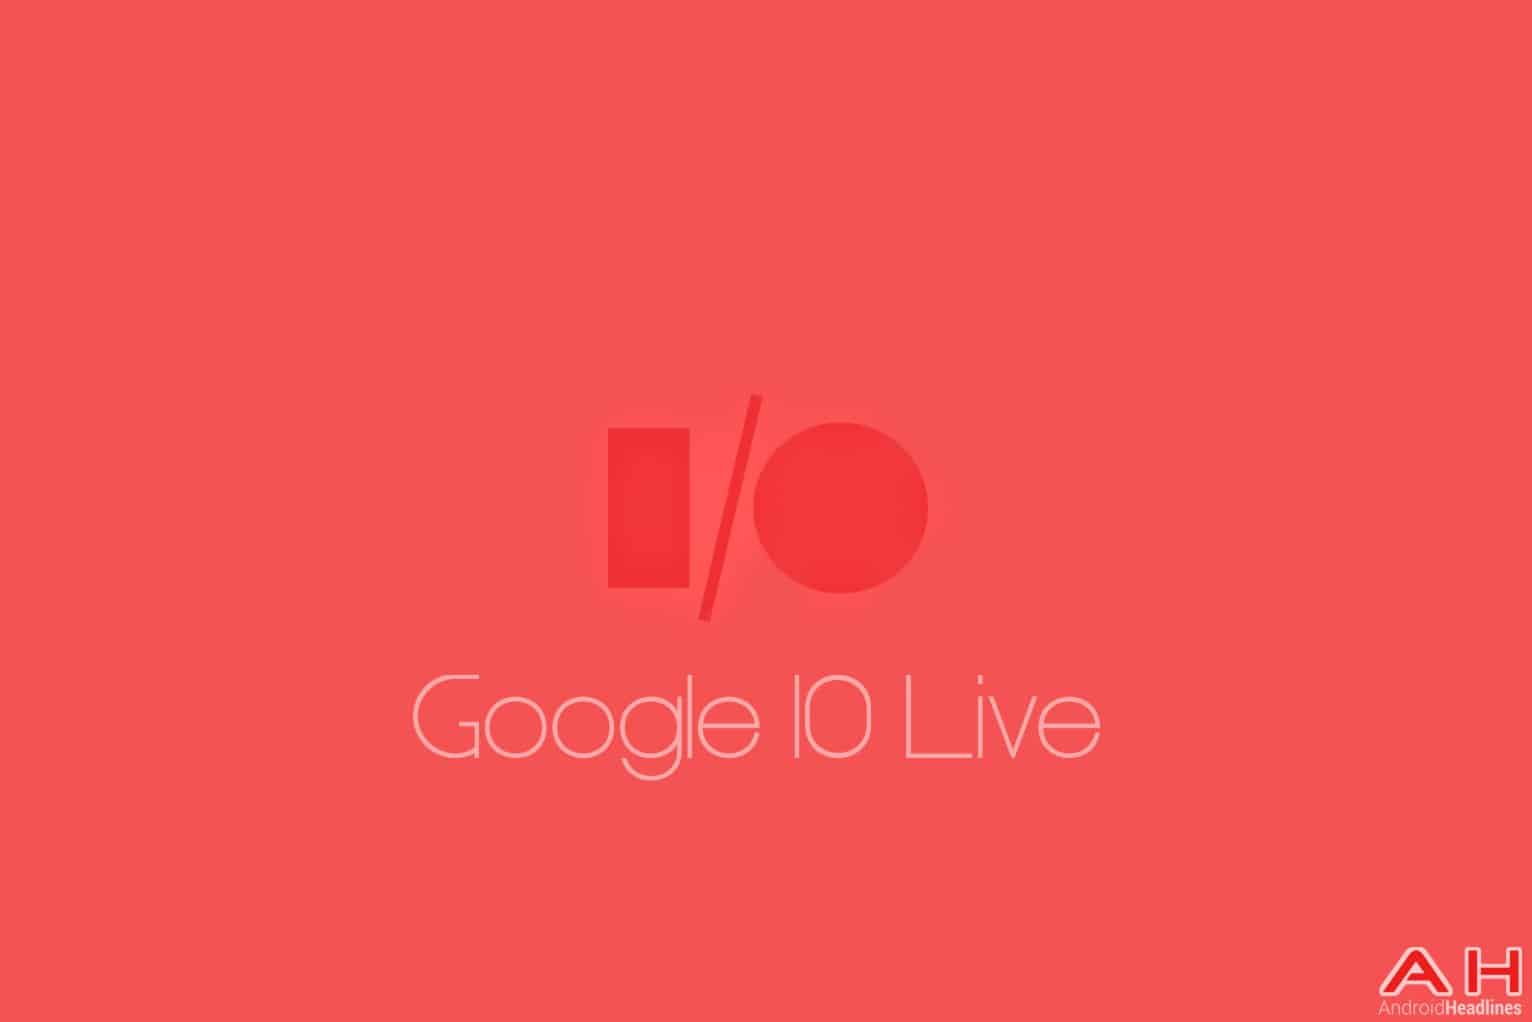 AH Google IO Live 2014